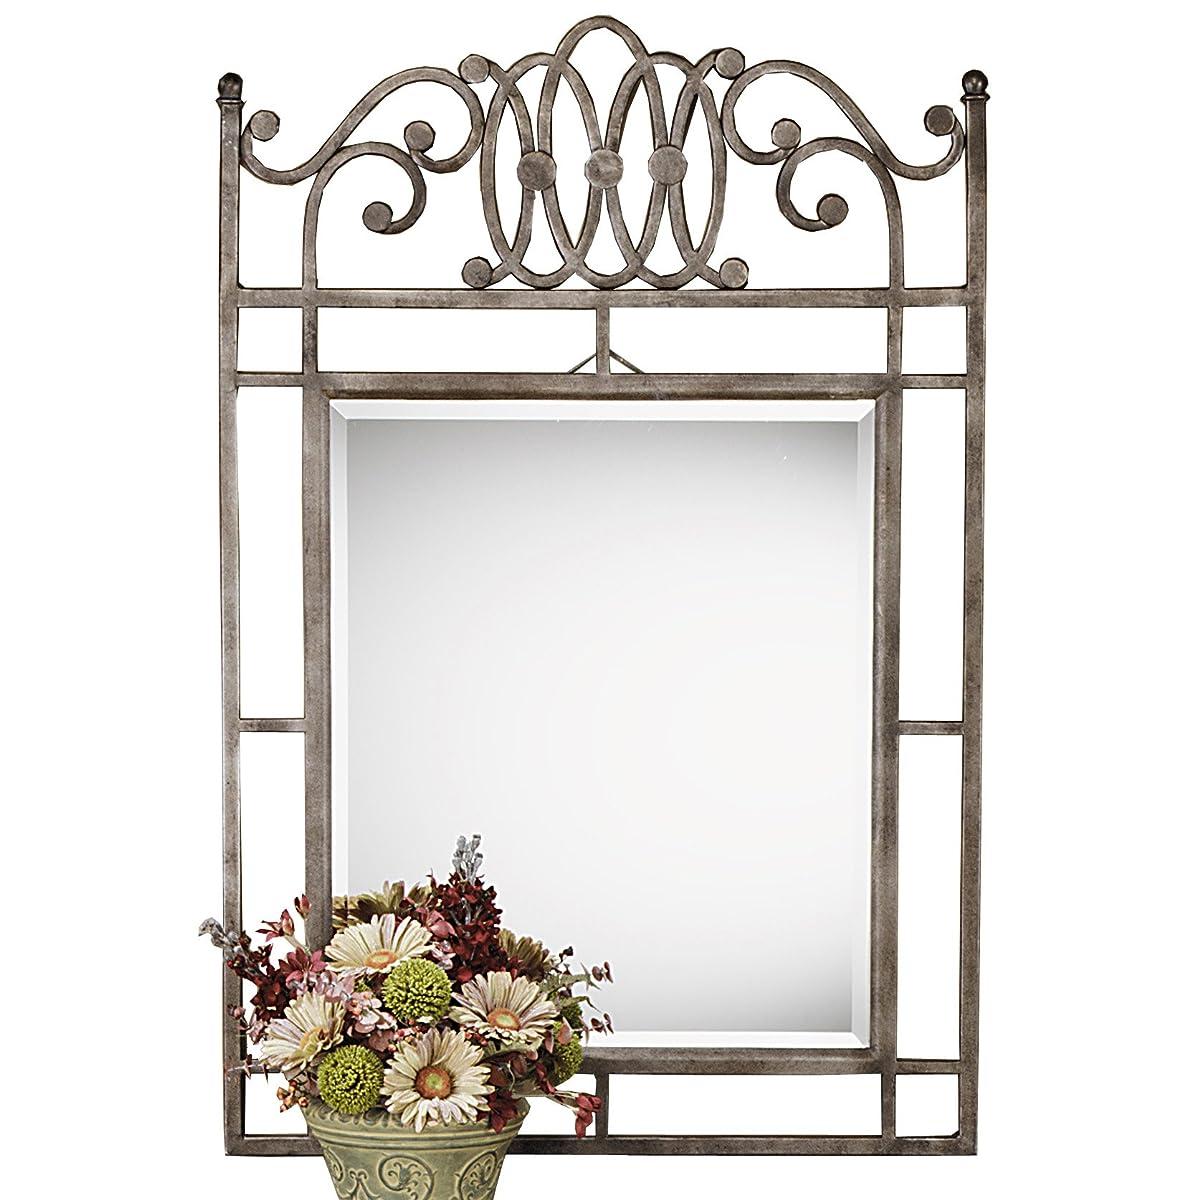 Hillsdale Montello Console Mirror, Old Steel